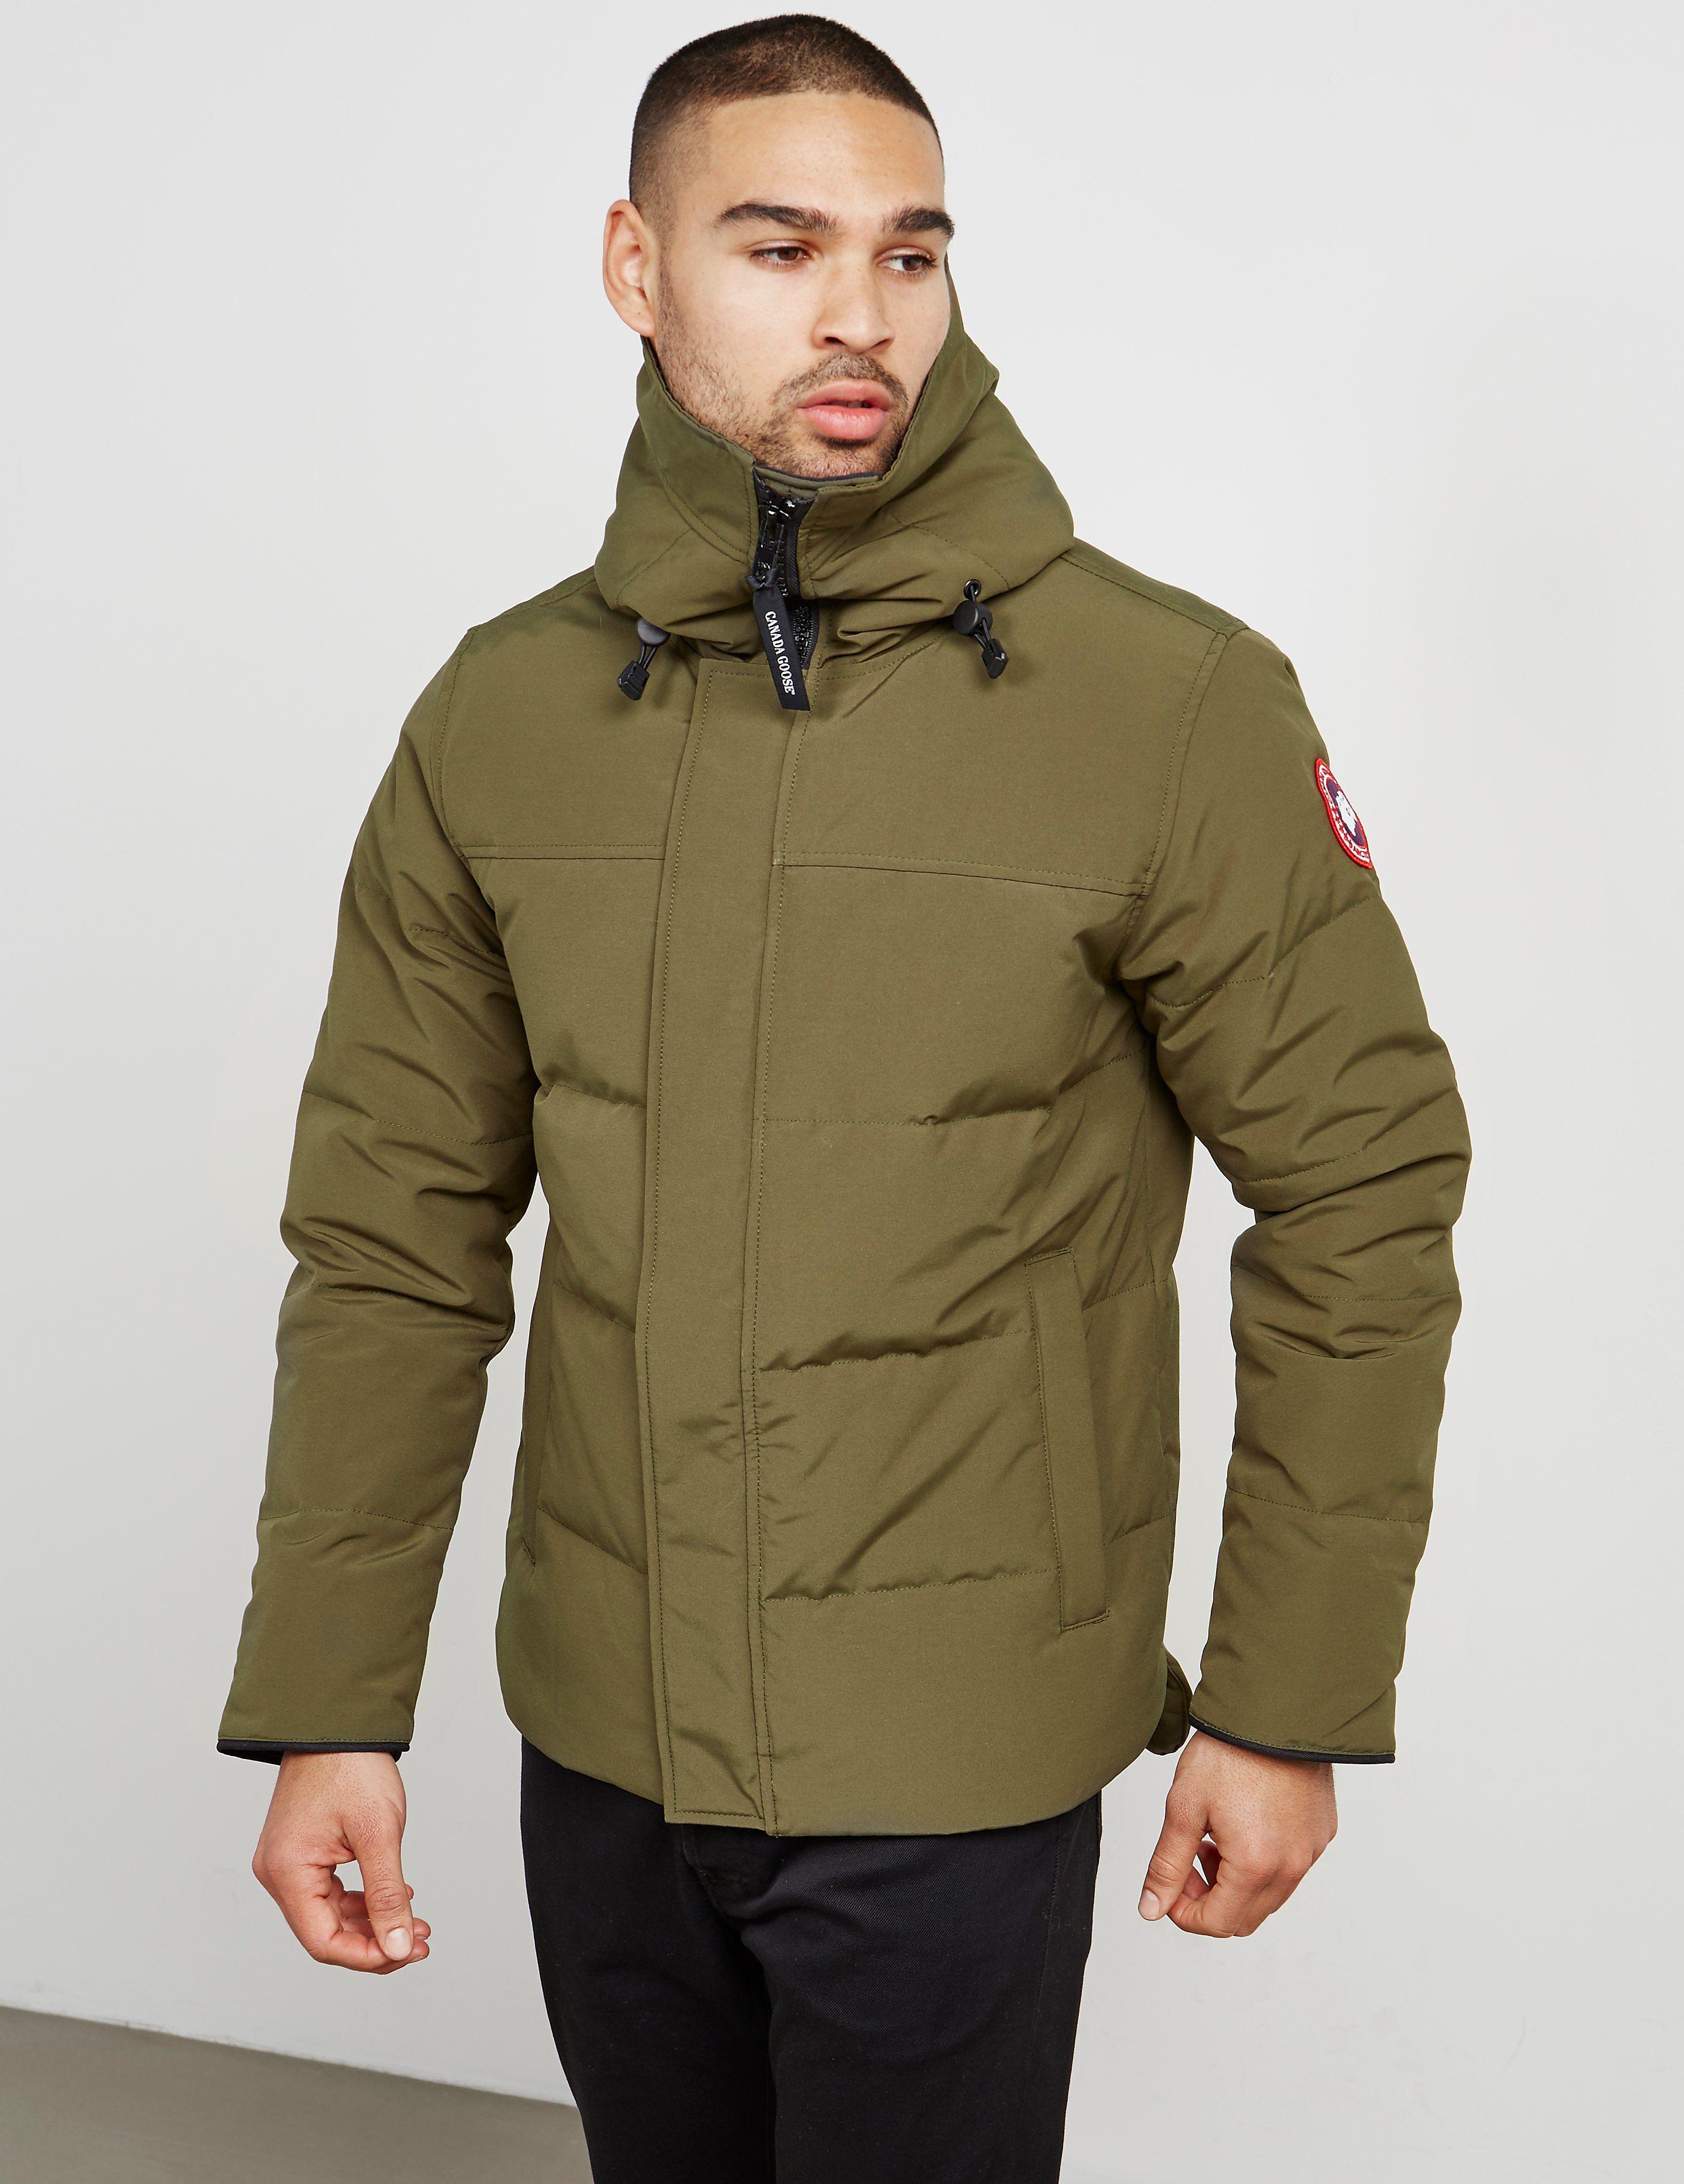 canada goose jackets mens